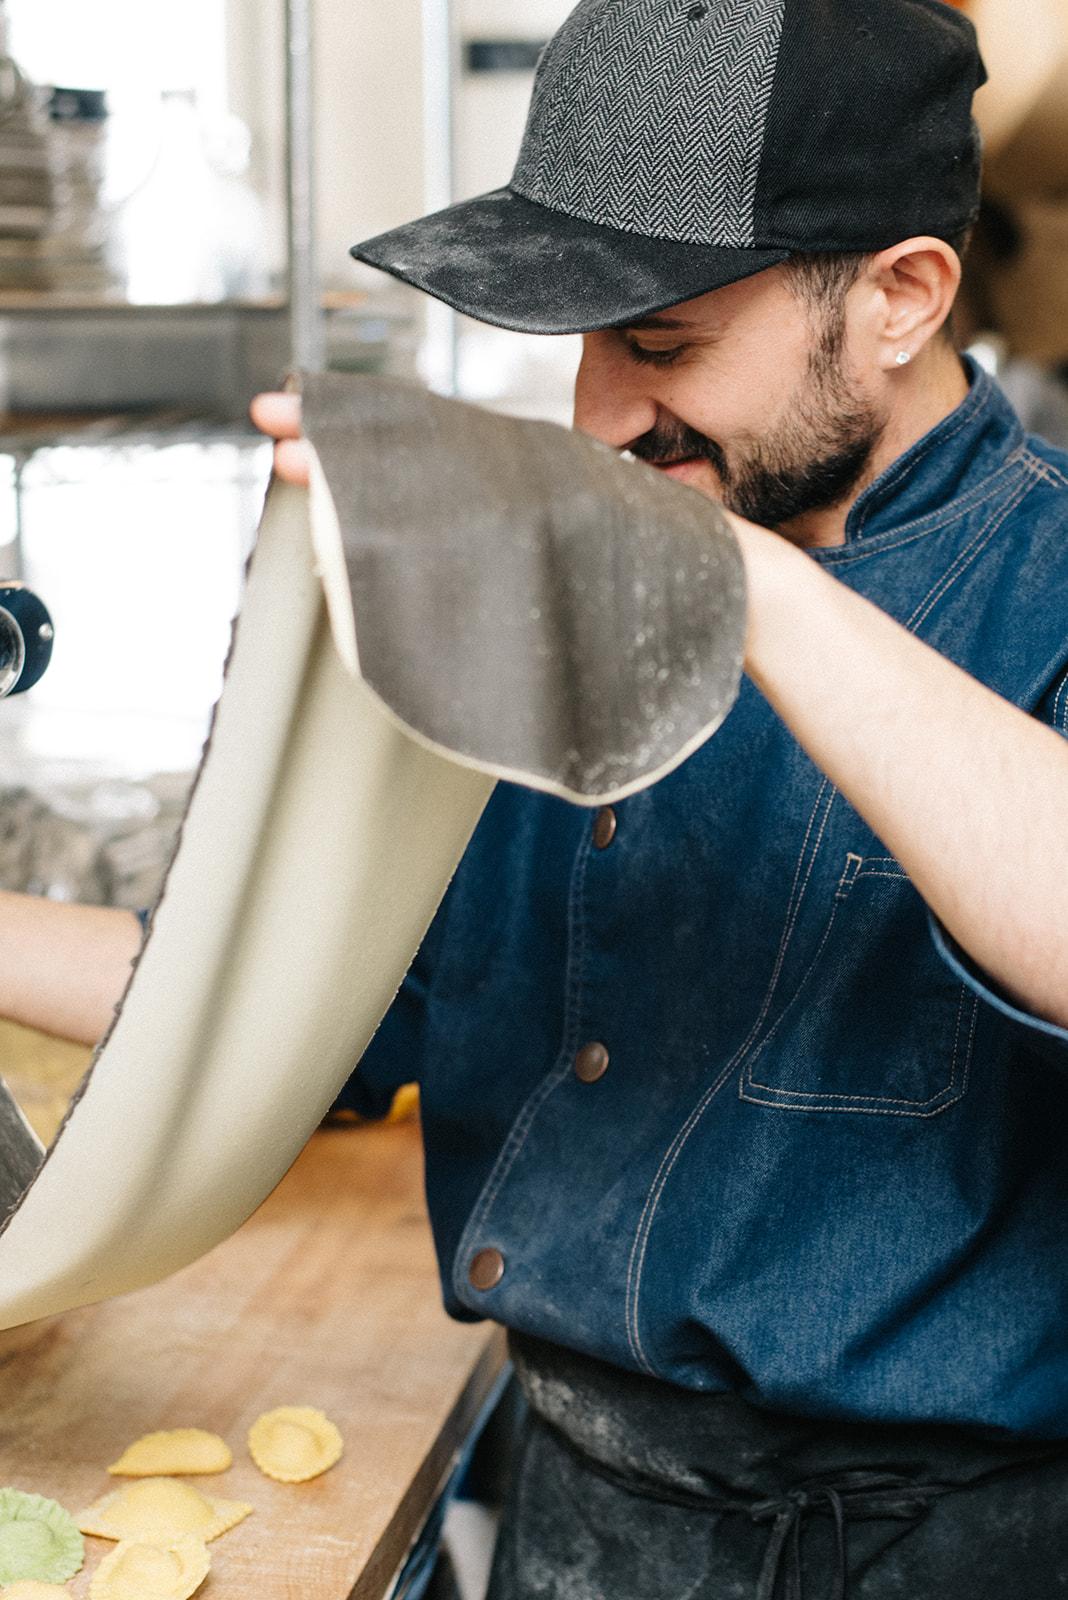 Chef Marco making black and white pasta at Birba image credit:  Sarah Dickenson